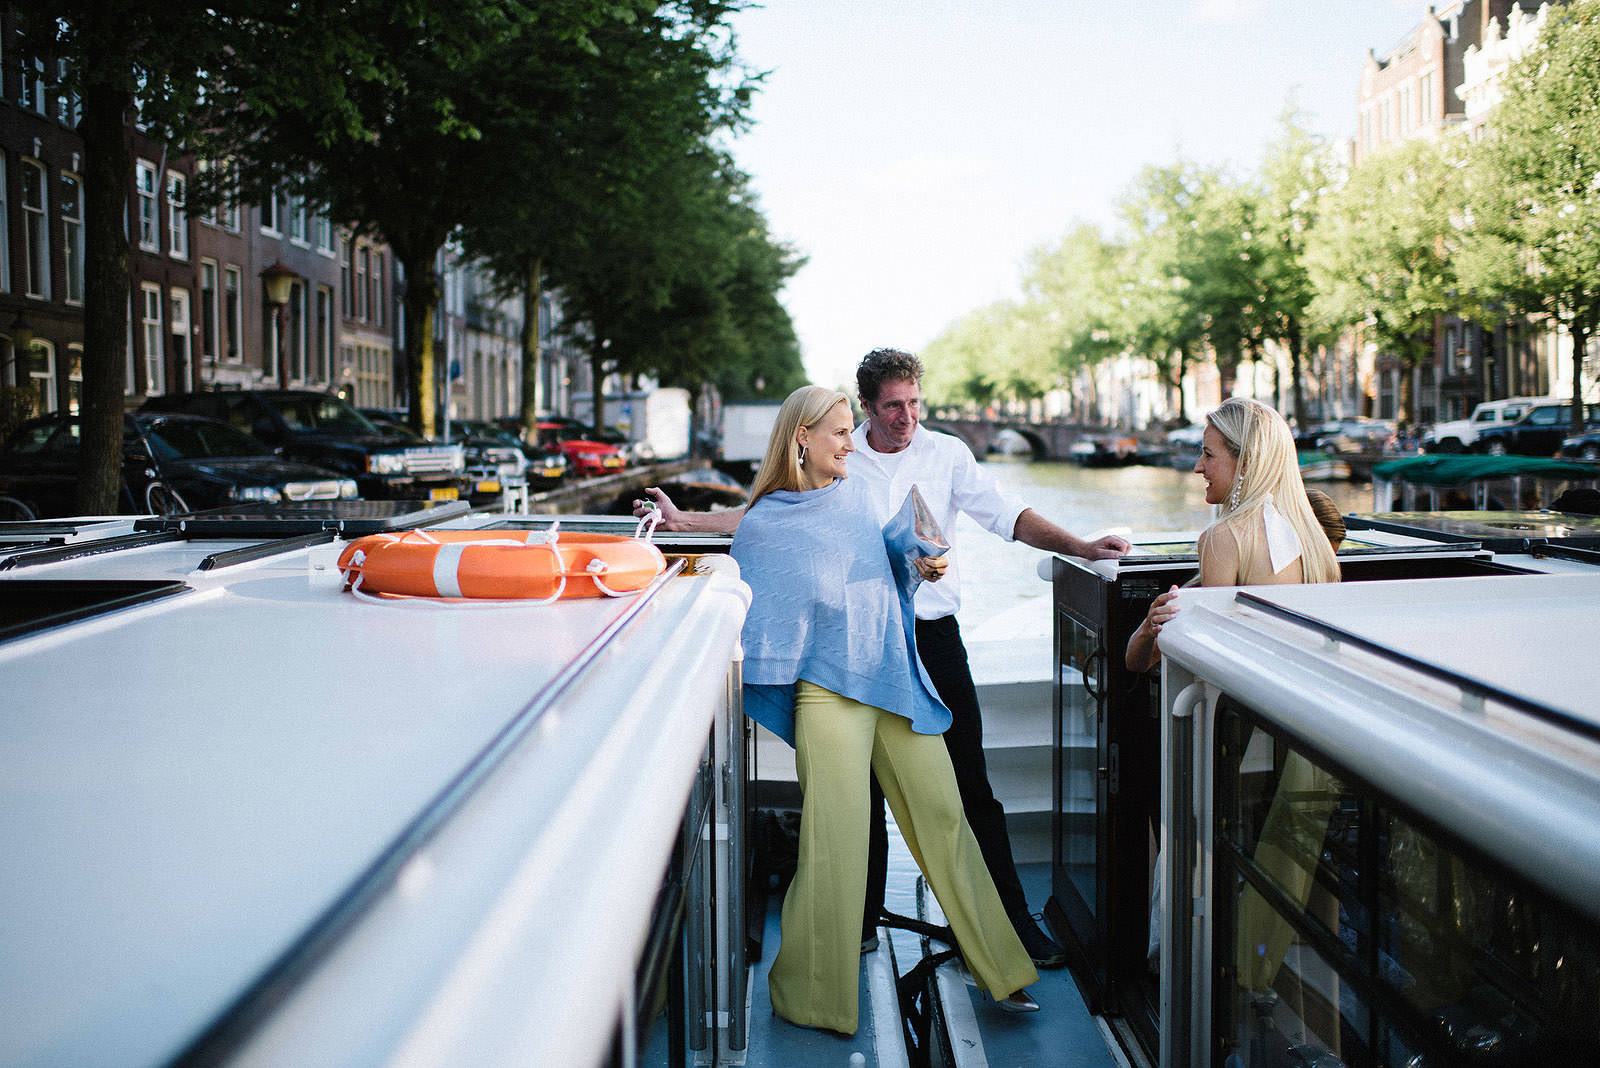 Fotograf Konstanz - Destination Wedding Photographer Amsterdam 092 - Destination Wedding Amsterdam  - 197 -